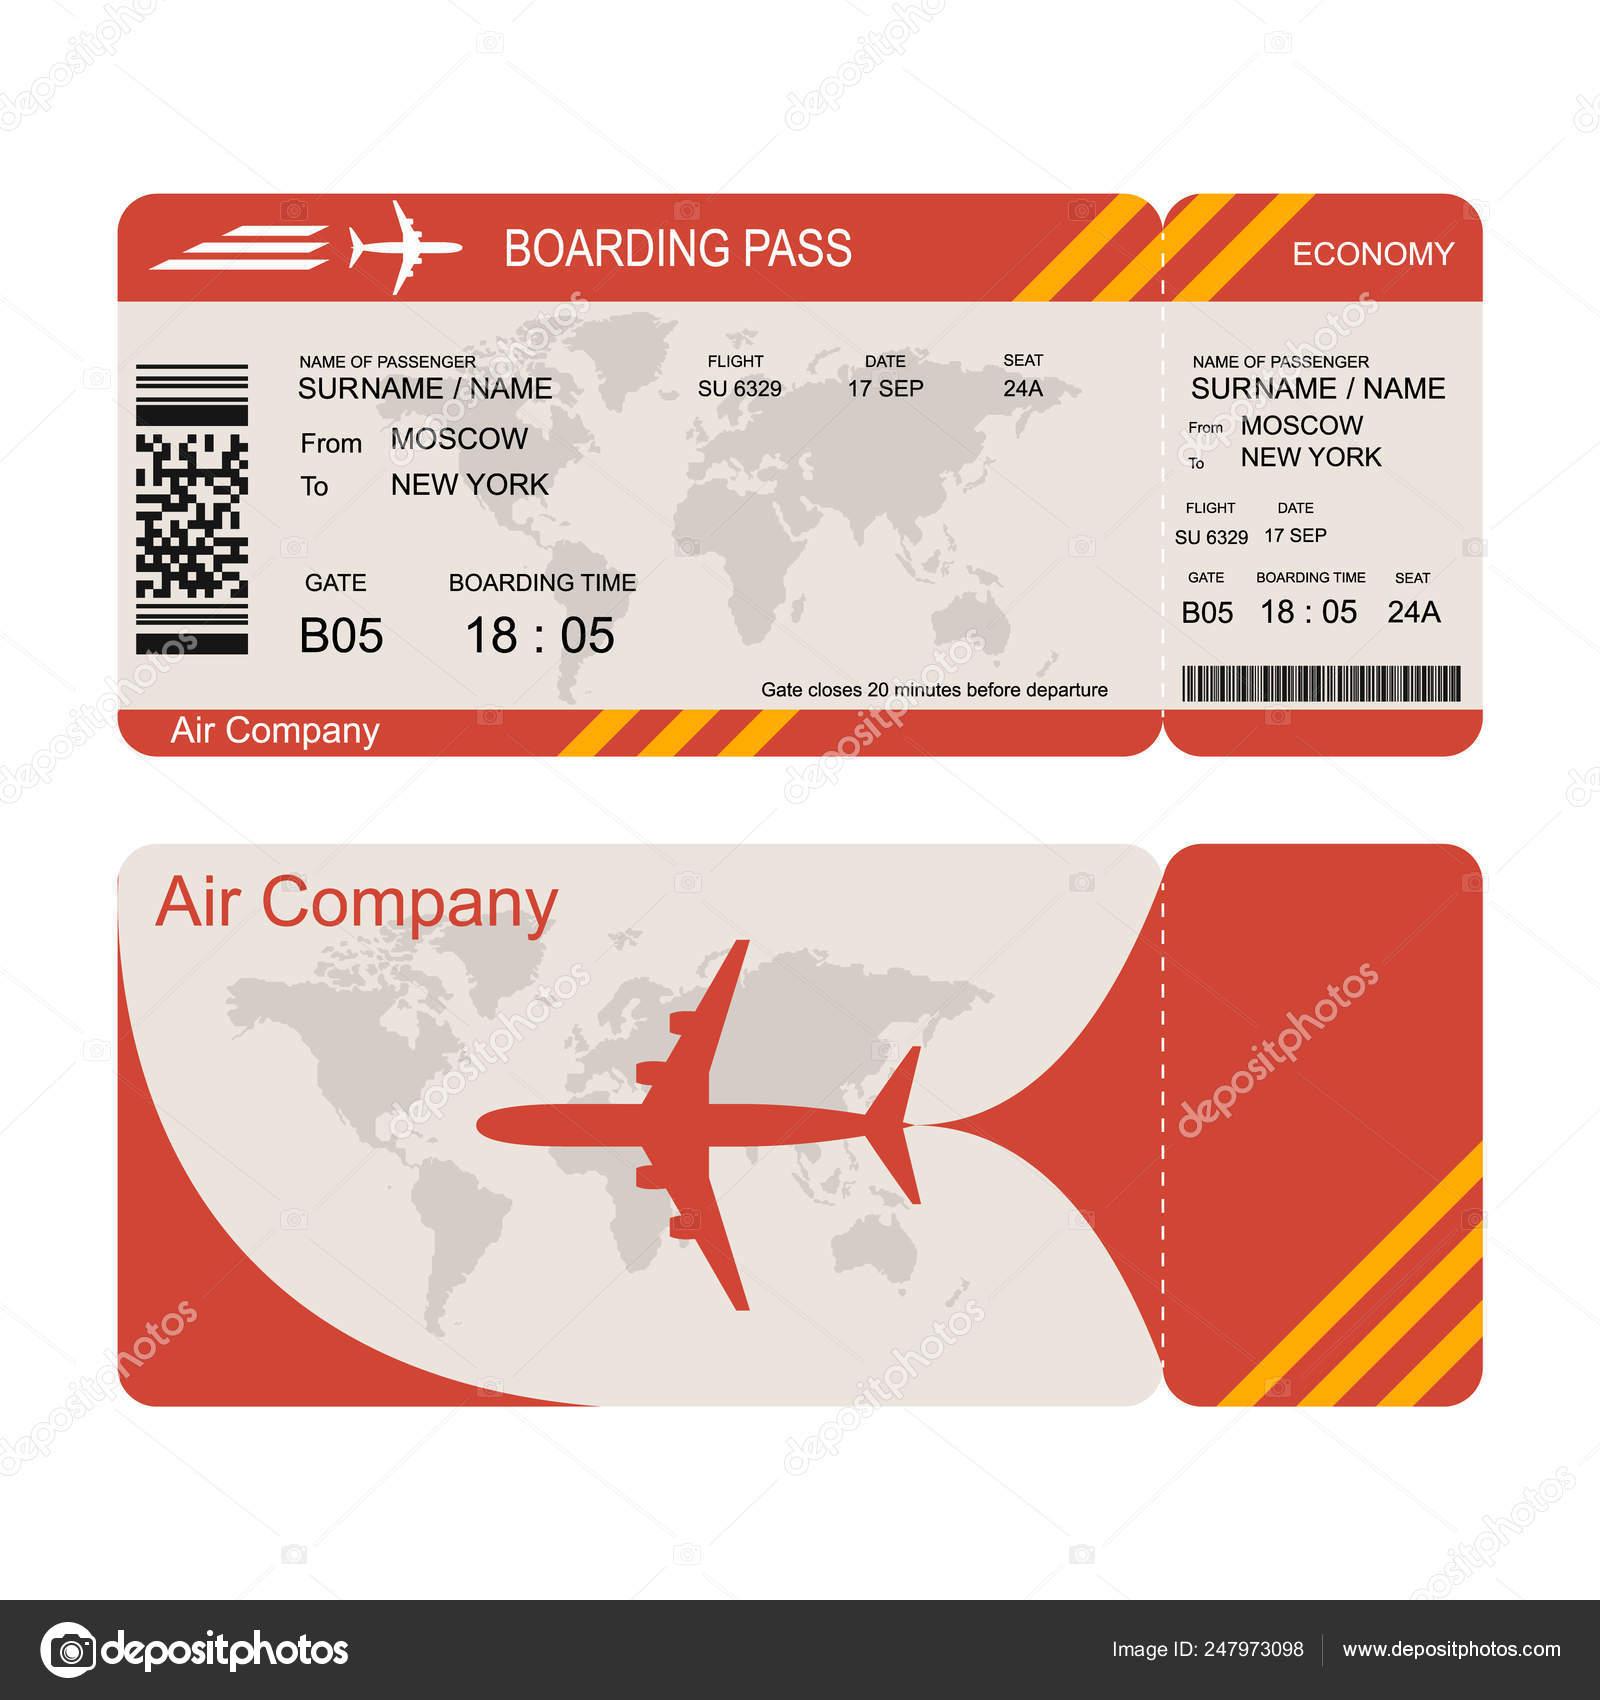 Flight Ticket Sample Picture Plane Ticket Template Air Economy Flight Stock Vector C Poganka06 247973098